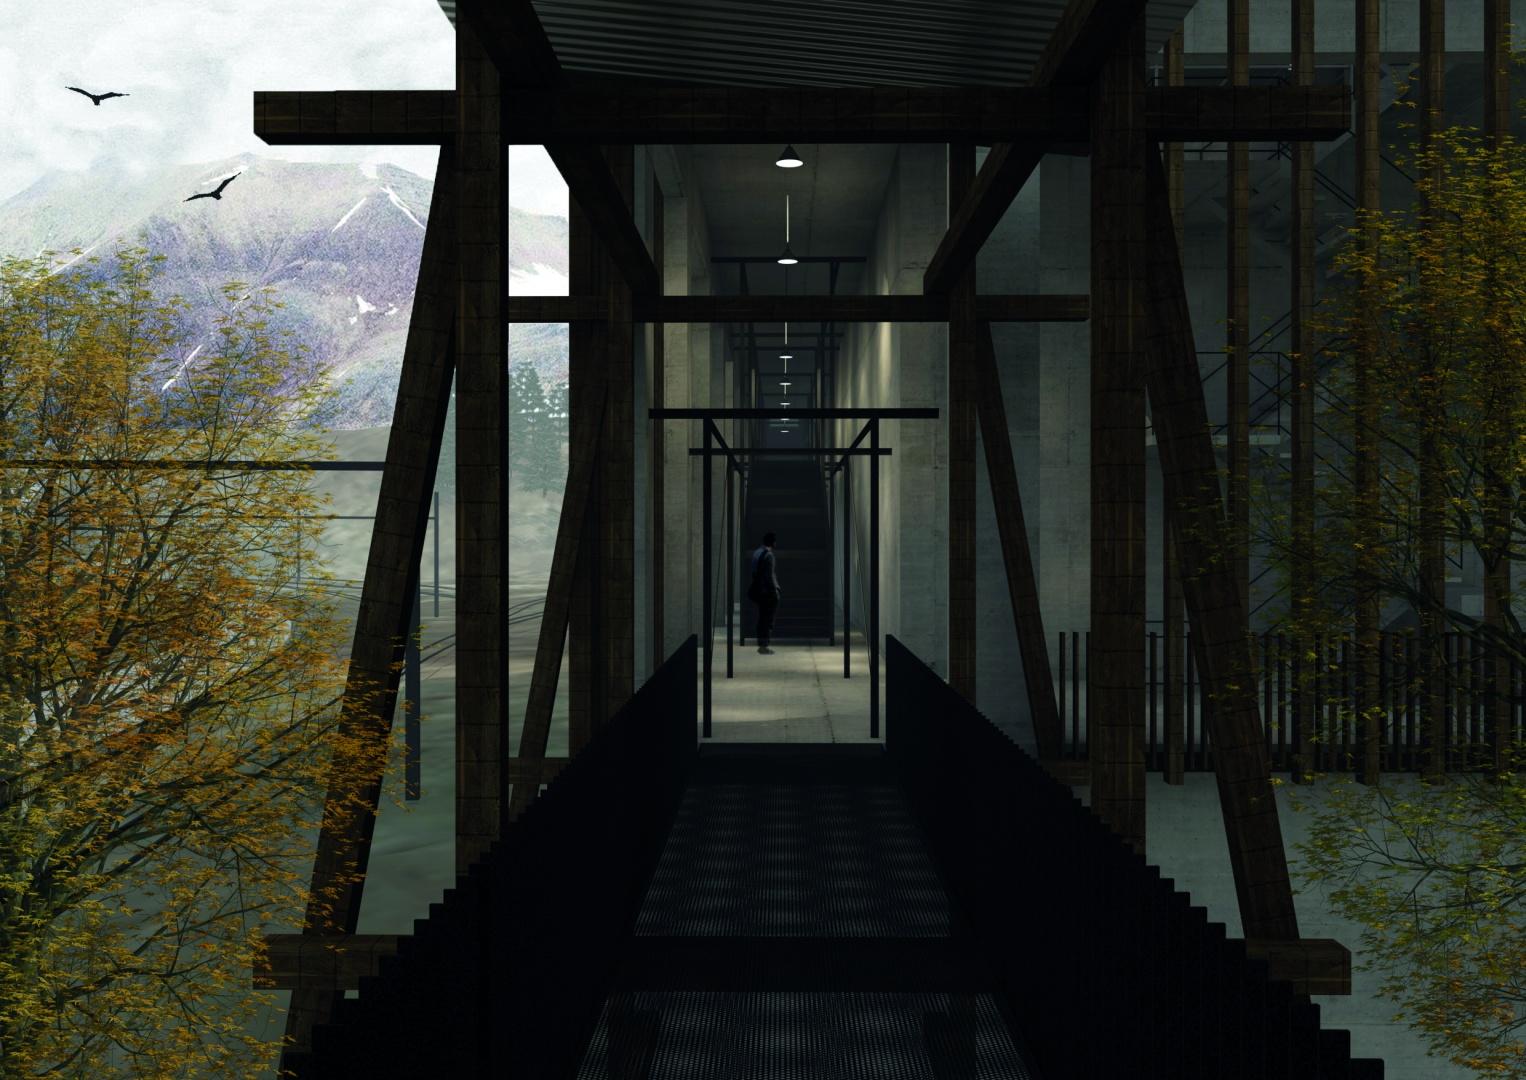 Wanderbrücke_01 © Davide Vinciguerra